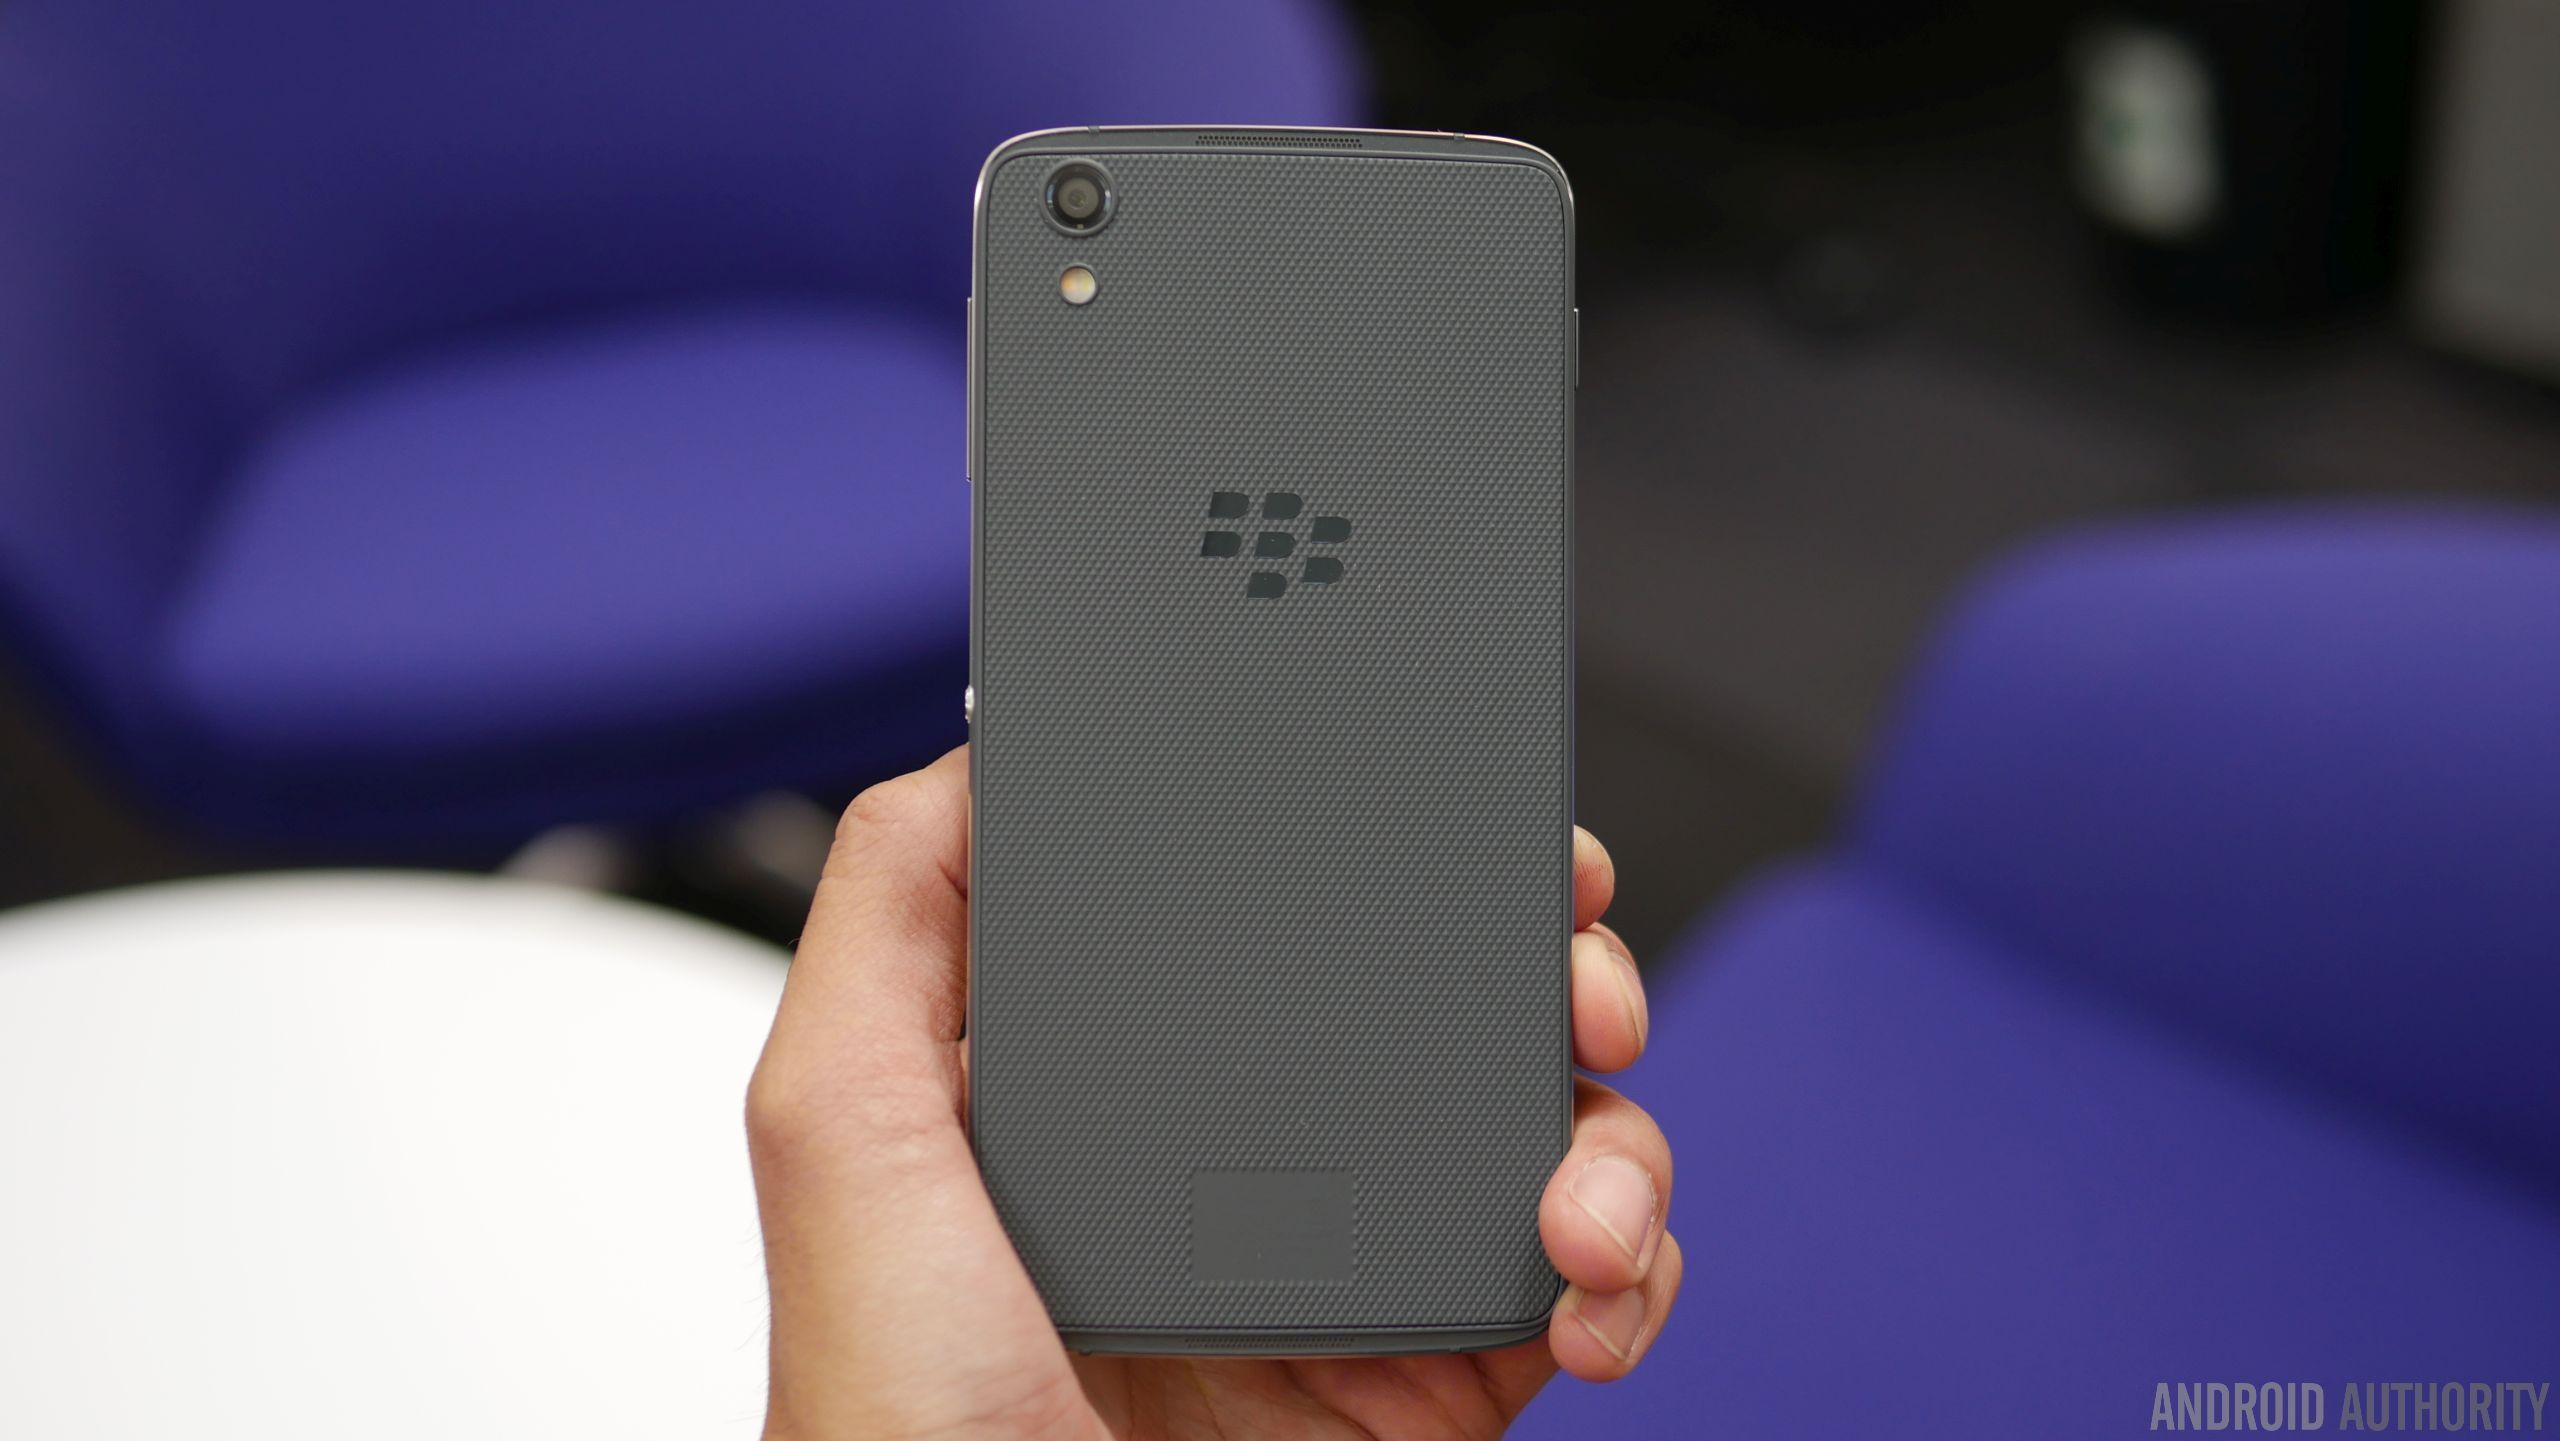 BlackBerry-DTEK50-hands-on-9